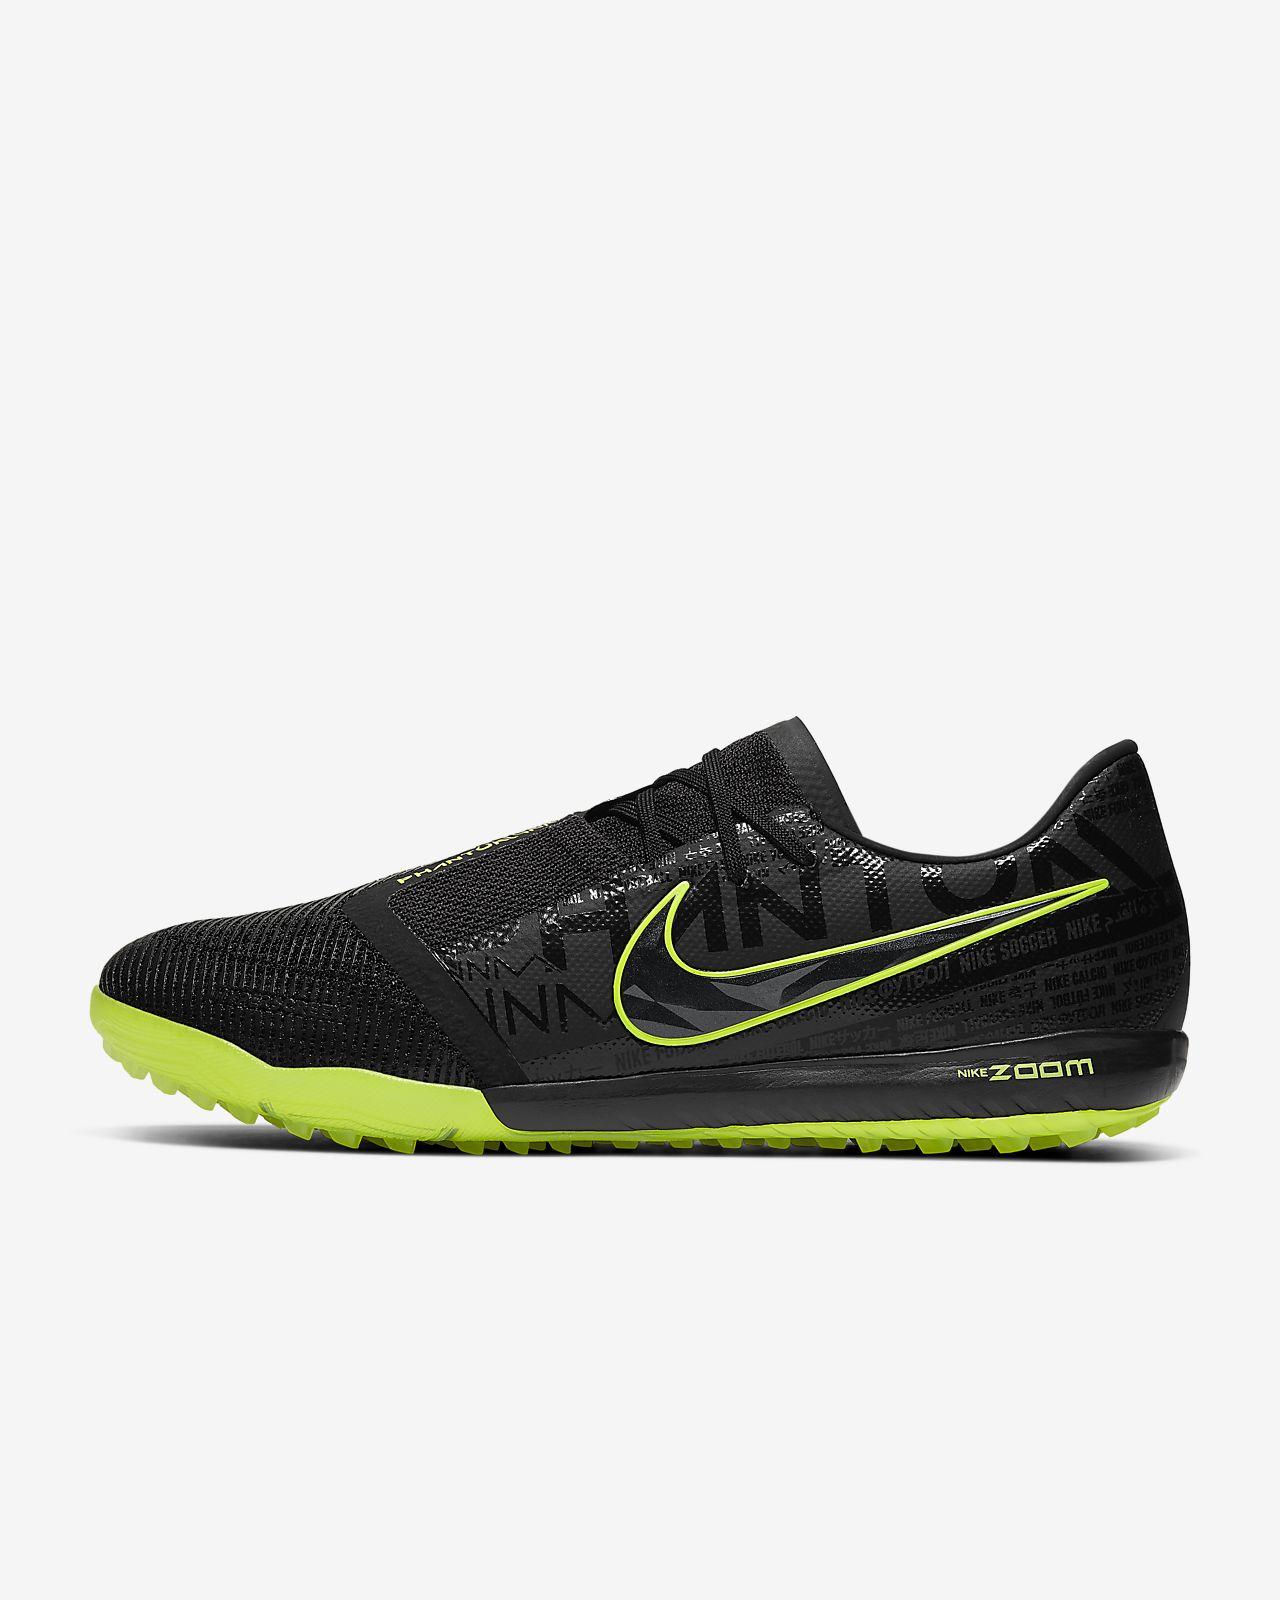 Chaussure de football pour surface synthétique Nike Zoom Phantom Venom Pro TF